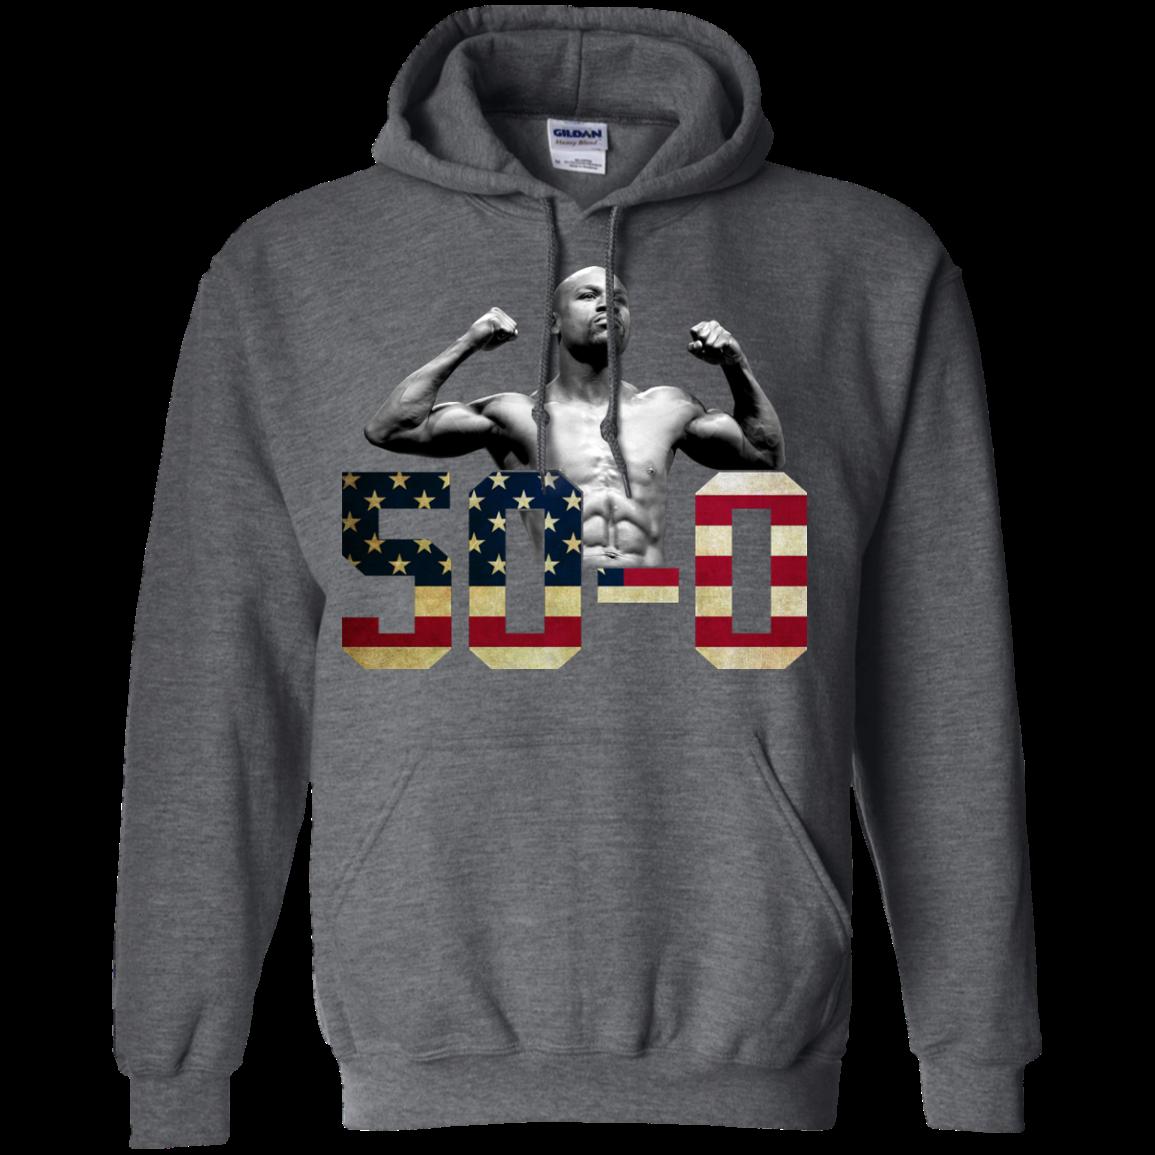 image 507px Floyd Mayweather 50 0 Shirt, Hoodies, Tank